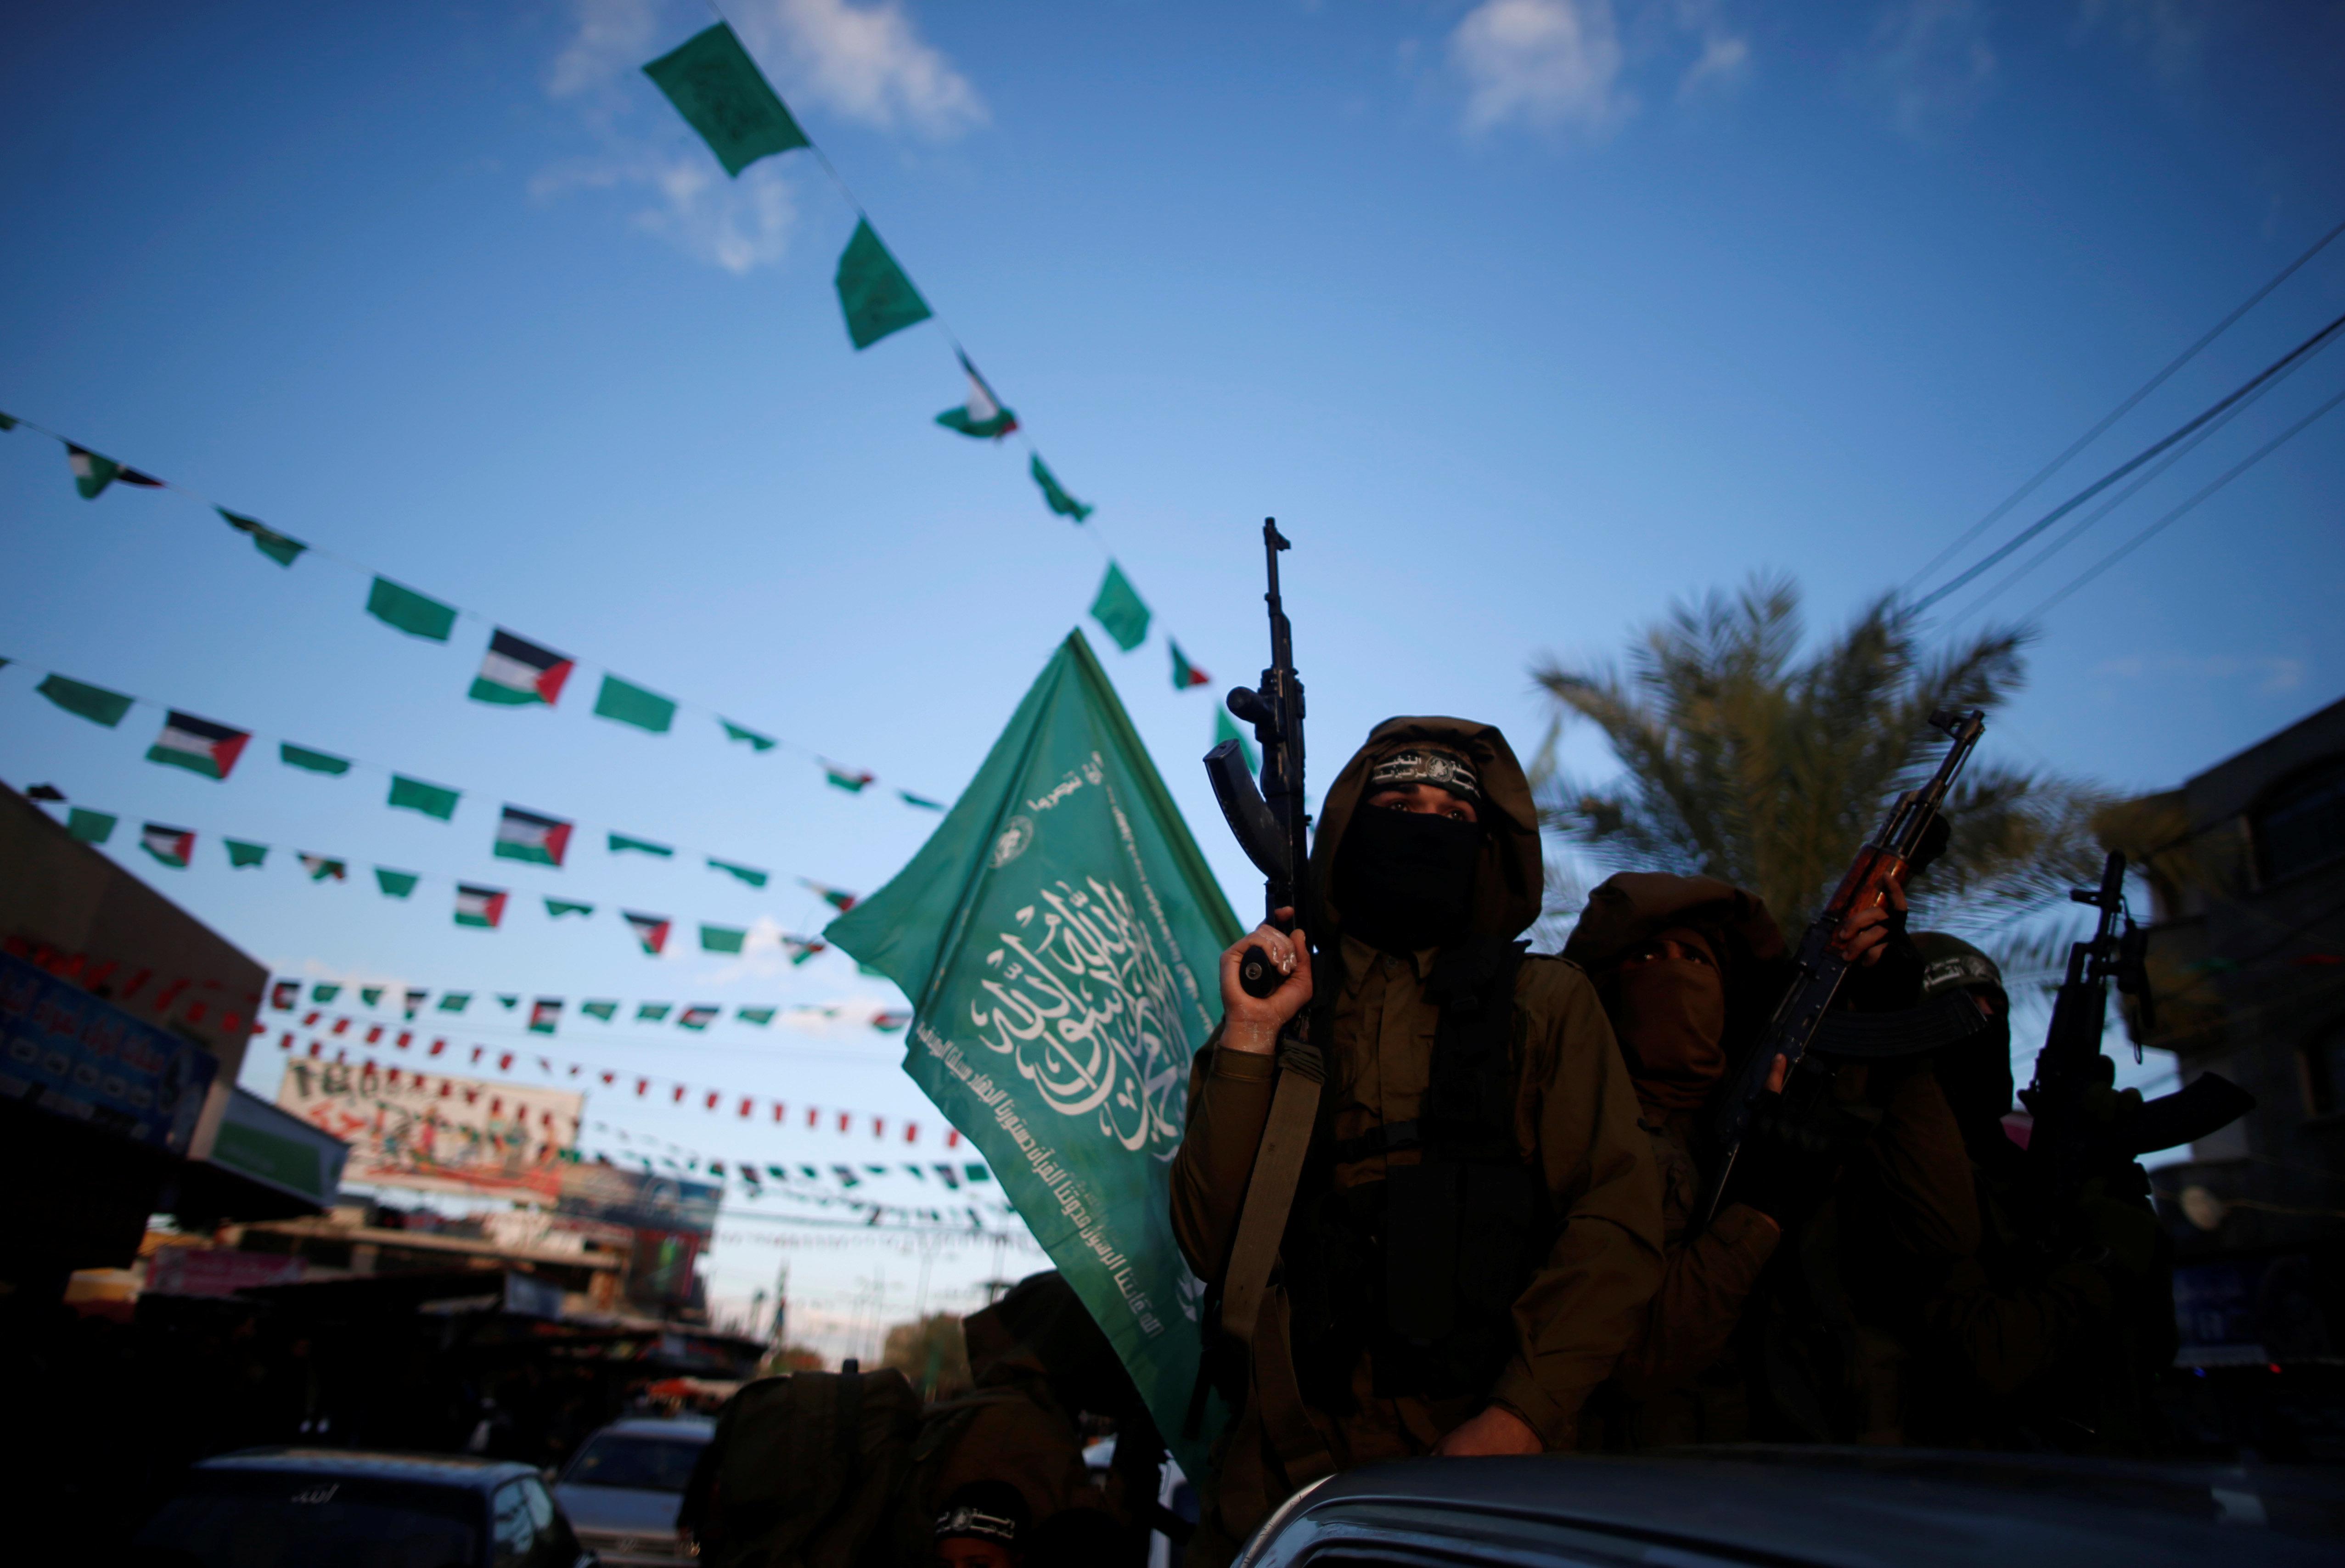 Hamas militants participate in a protest on Dec. 7, 2017 against U.S. President Donald Trump's decision to recognize Jerusale